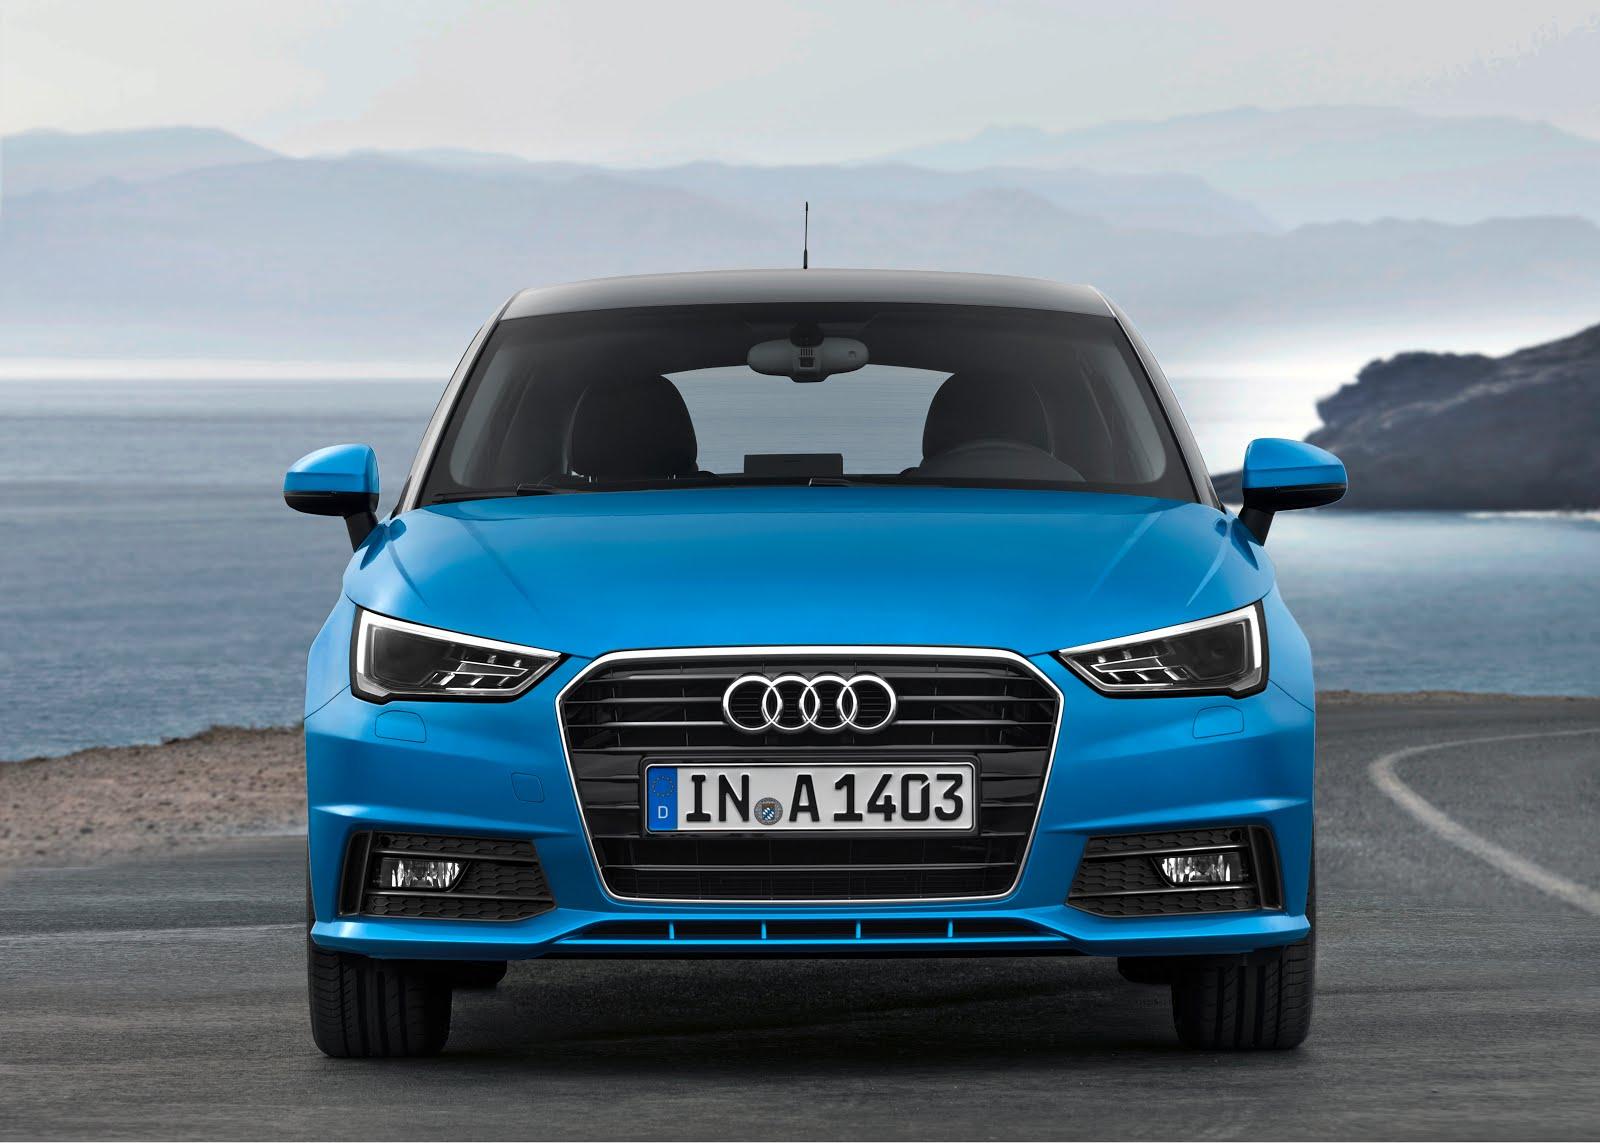 92g_km and 99g_km petrol stars join new Audi A1 range-60406.jpg